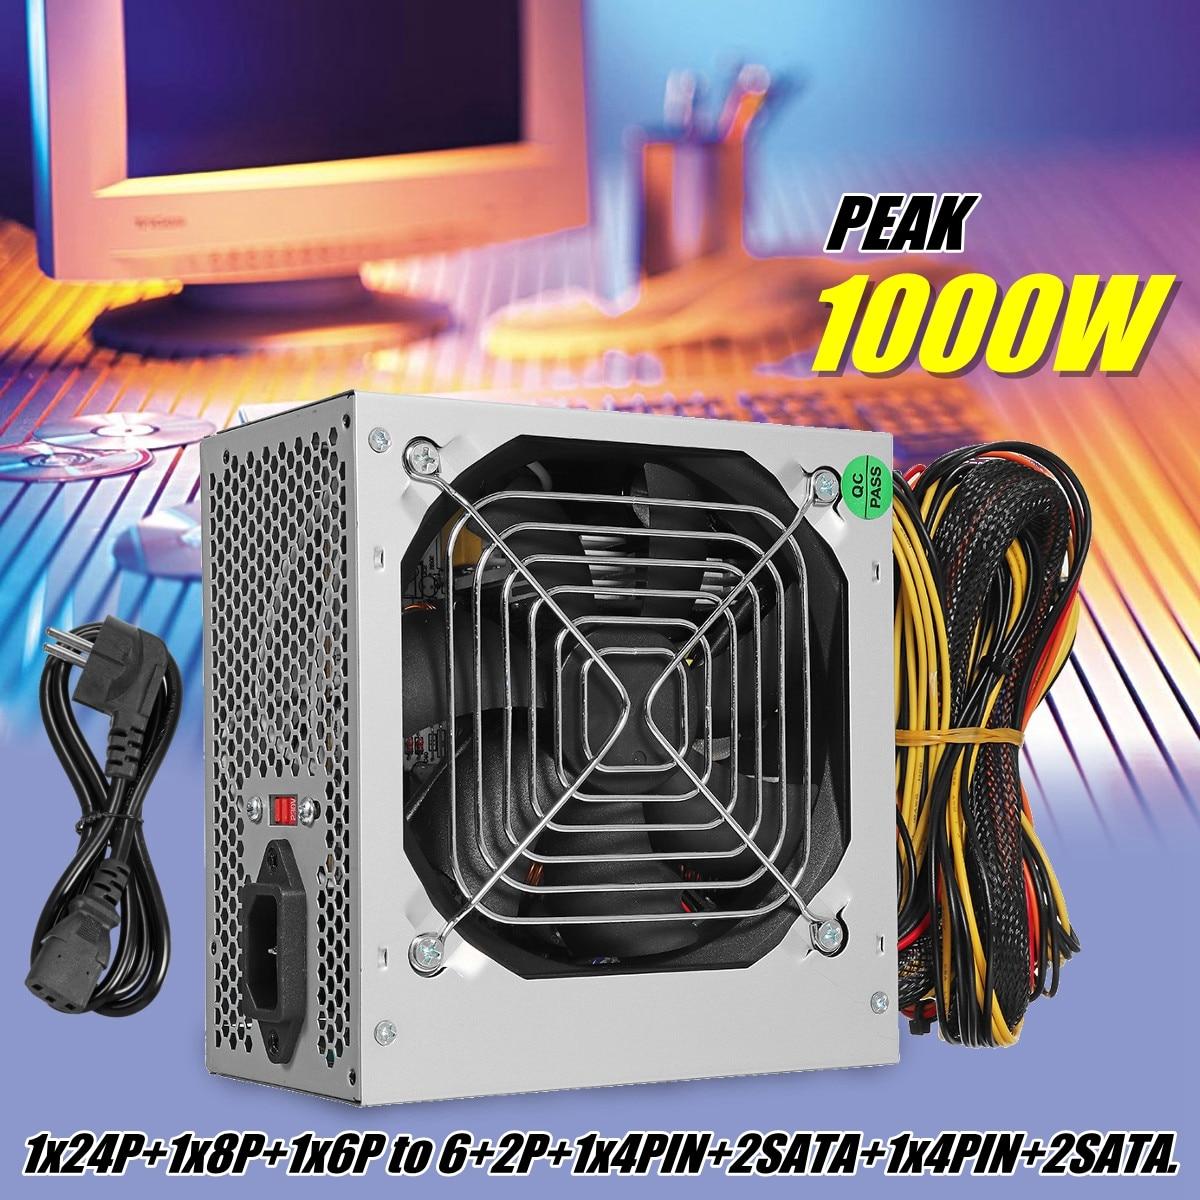 Max 1000 Вт ATX питание тихий вентилятор для Intel AMD блок питания для ПК PC компьютер шахтер